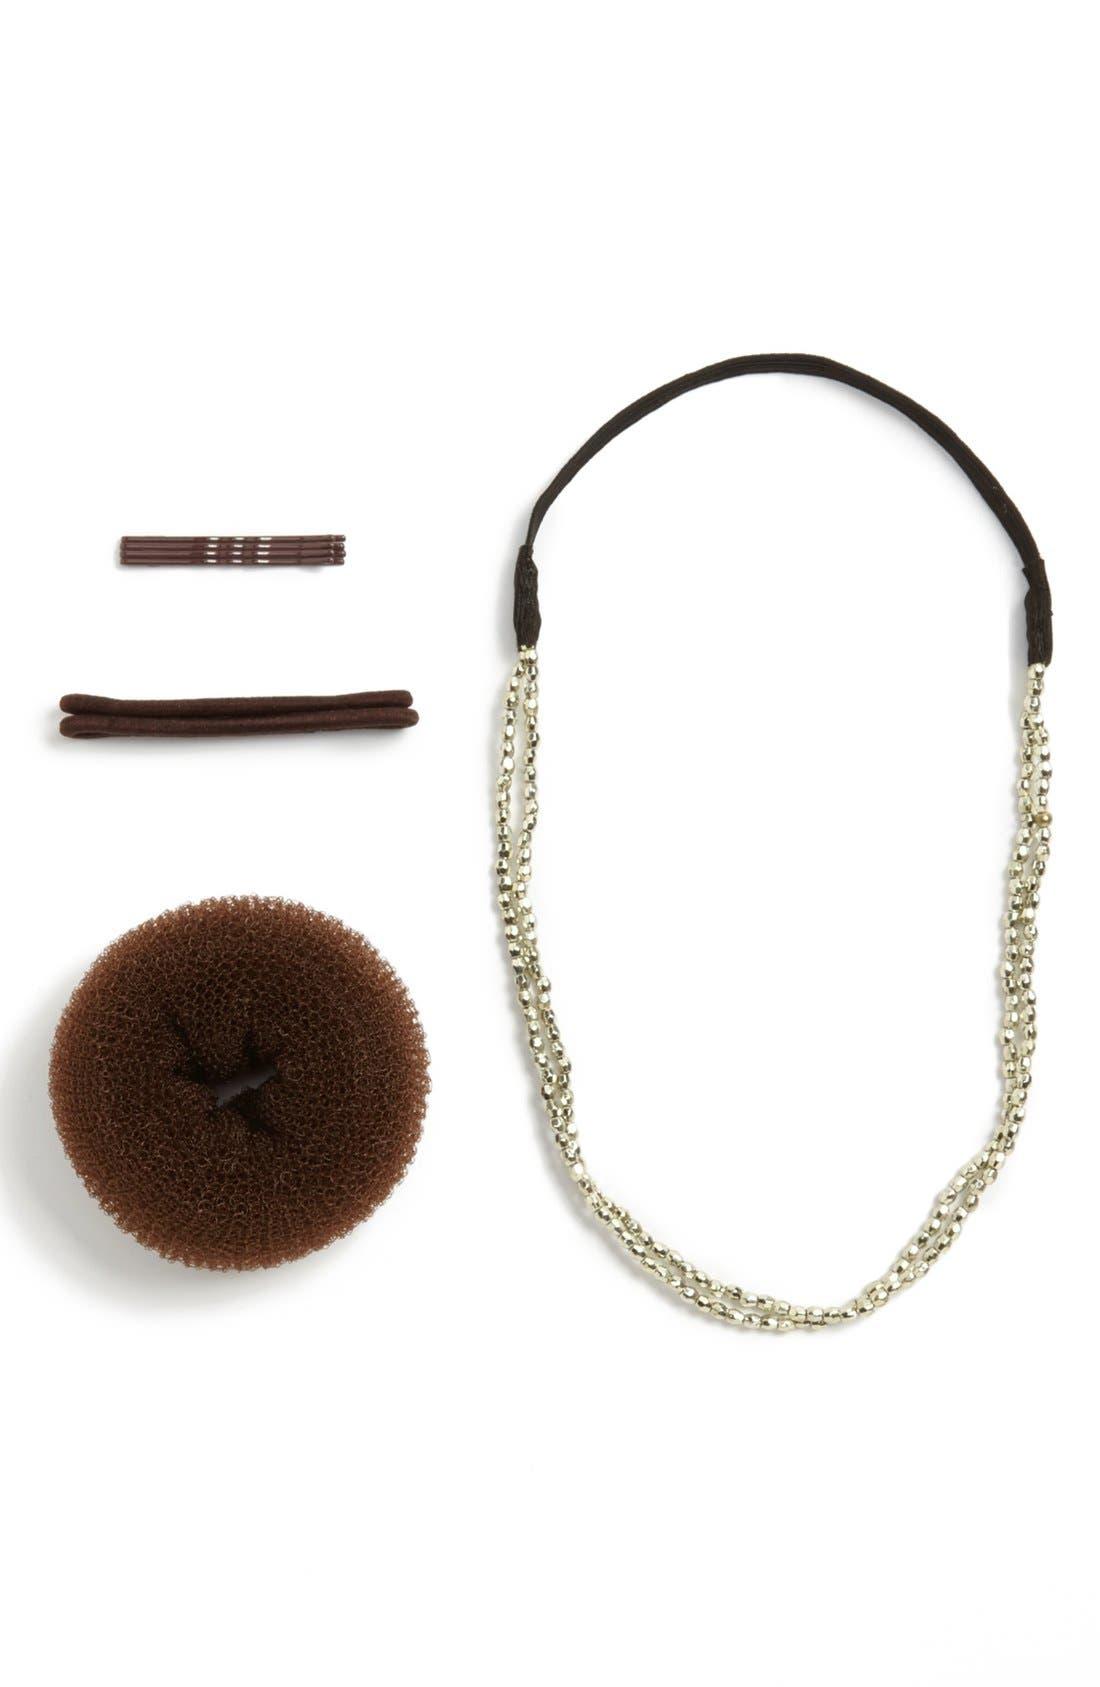 Alternate Image 1 Selected - Capelli of New York Headband & Bun Shaper Kit (Juniors) (Online Only)